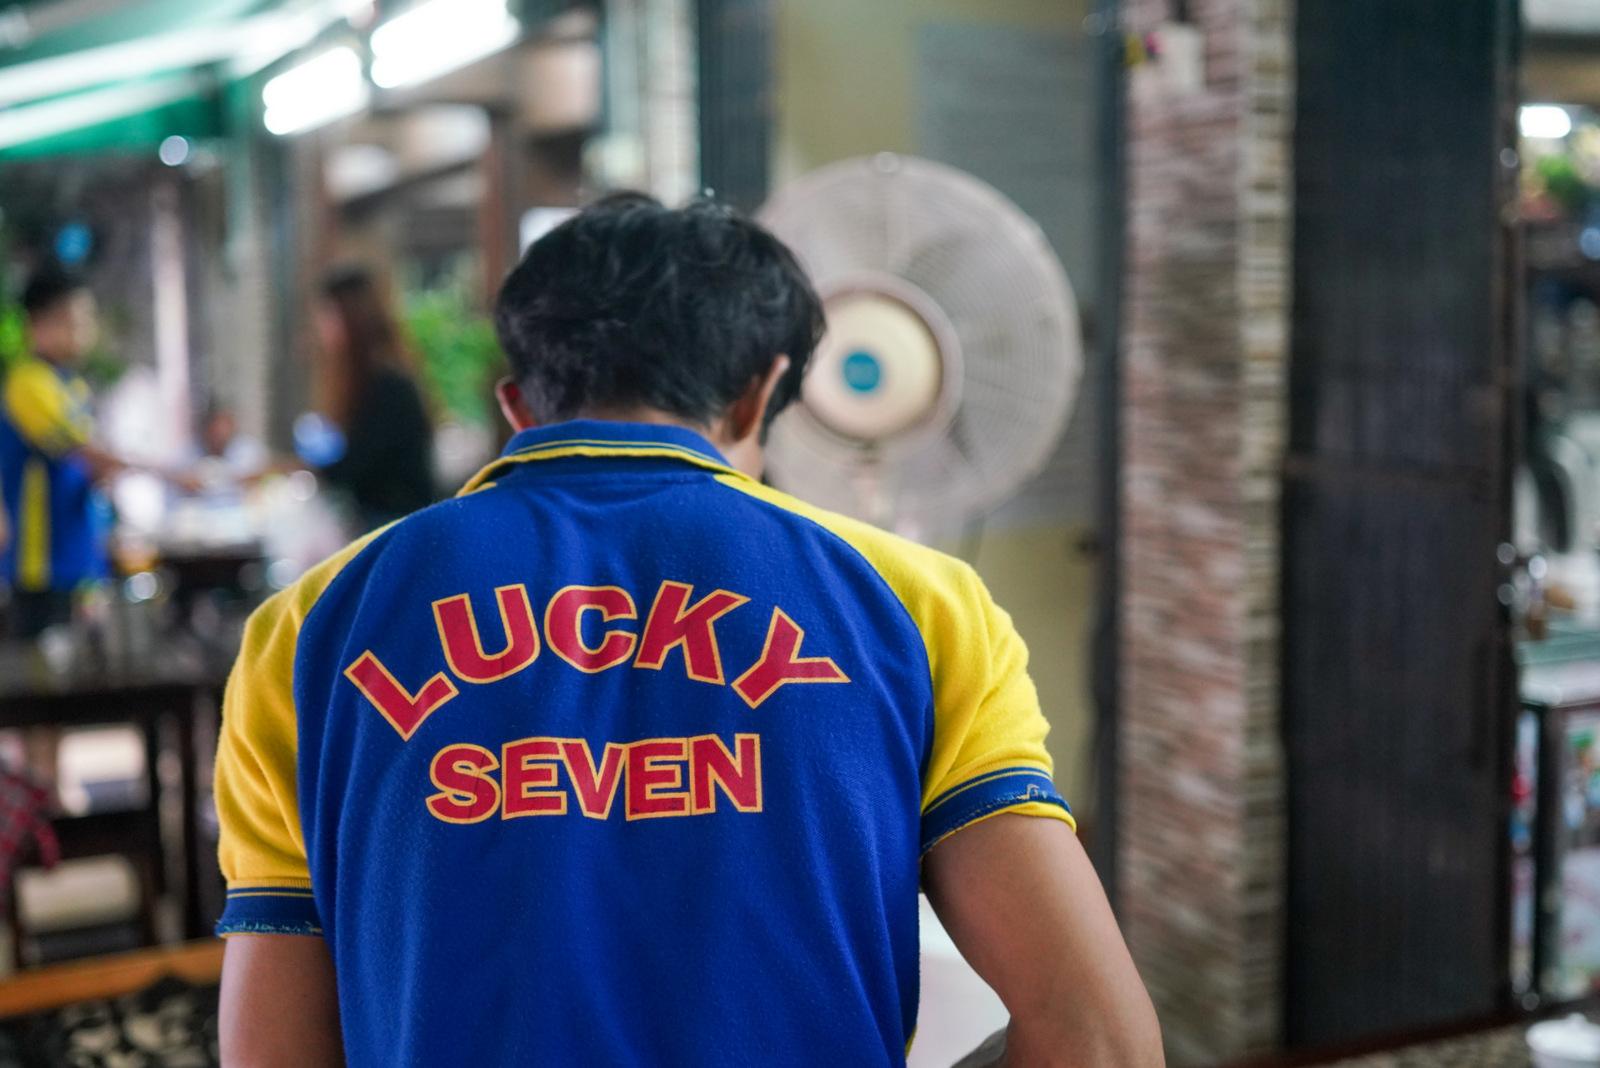 lucky seven, myanmar